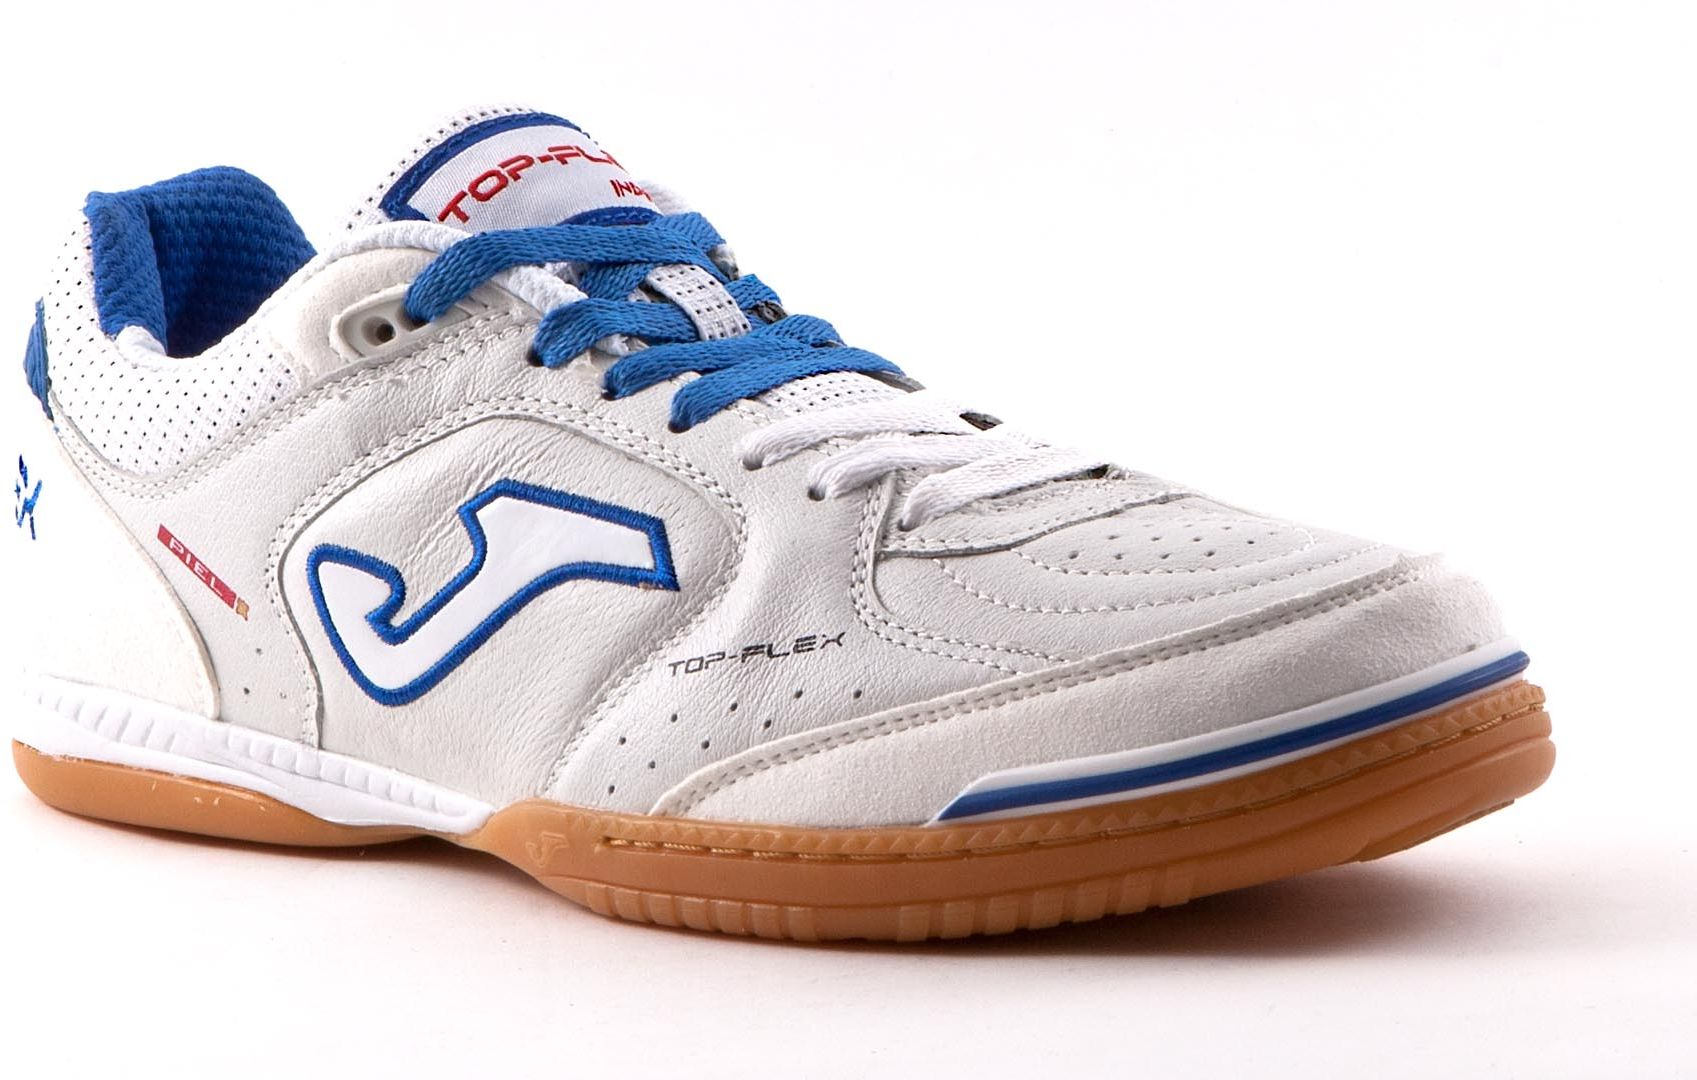 Joma sport Indoor shoes Futbol Sala Men Top Flex 602 White Royal. 41